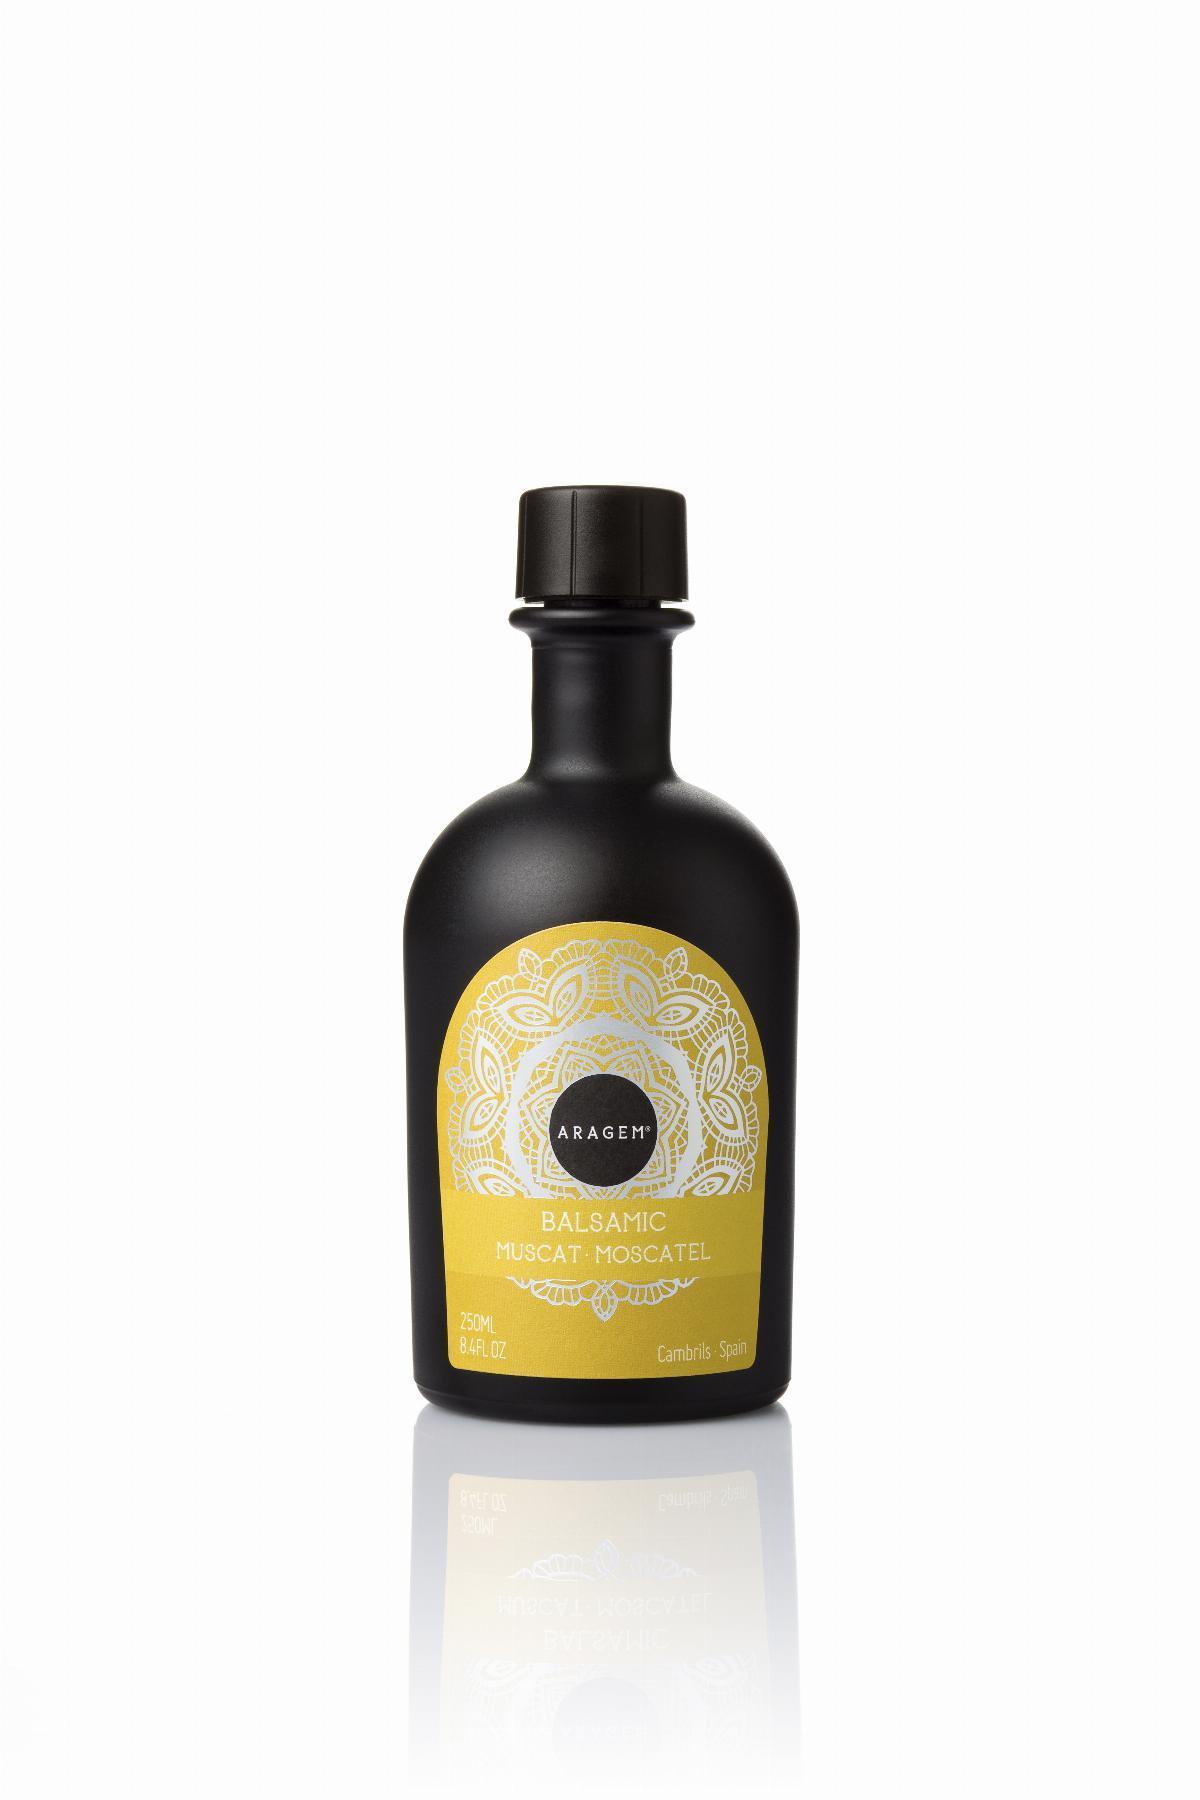 Vinagre  - Vinagre Balsámico de Moscatel Aragem, botella negra 250 ml - Mestral Cambrils